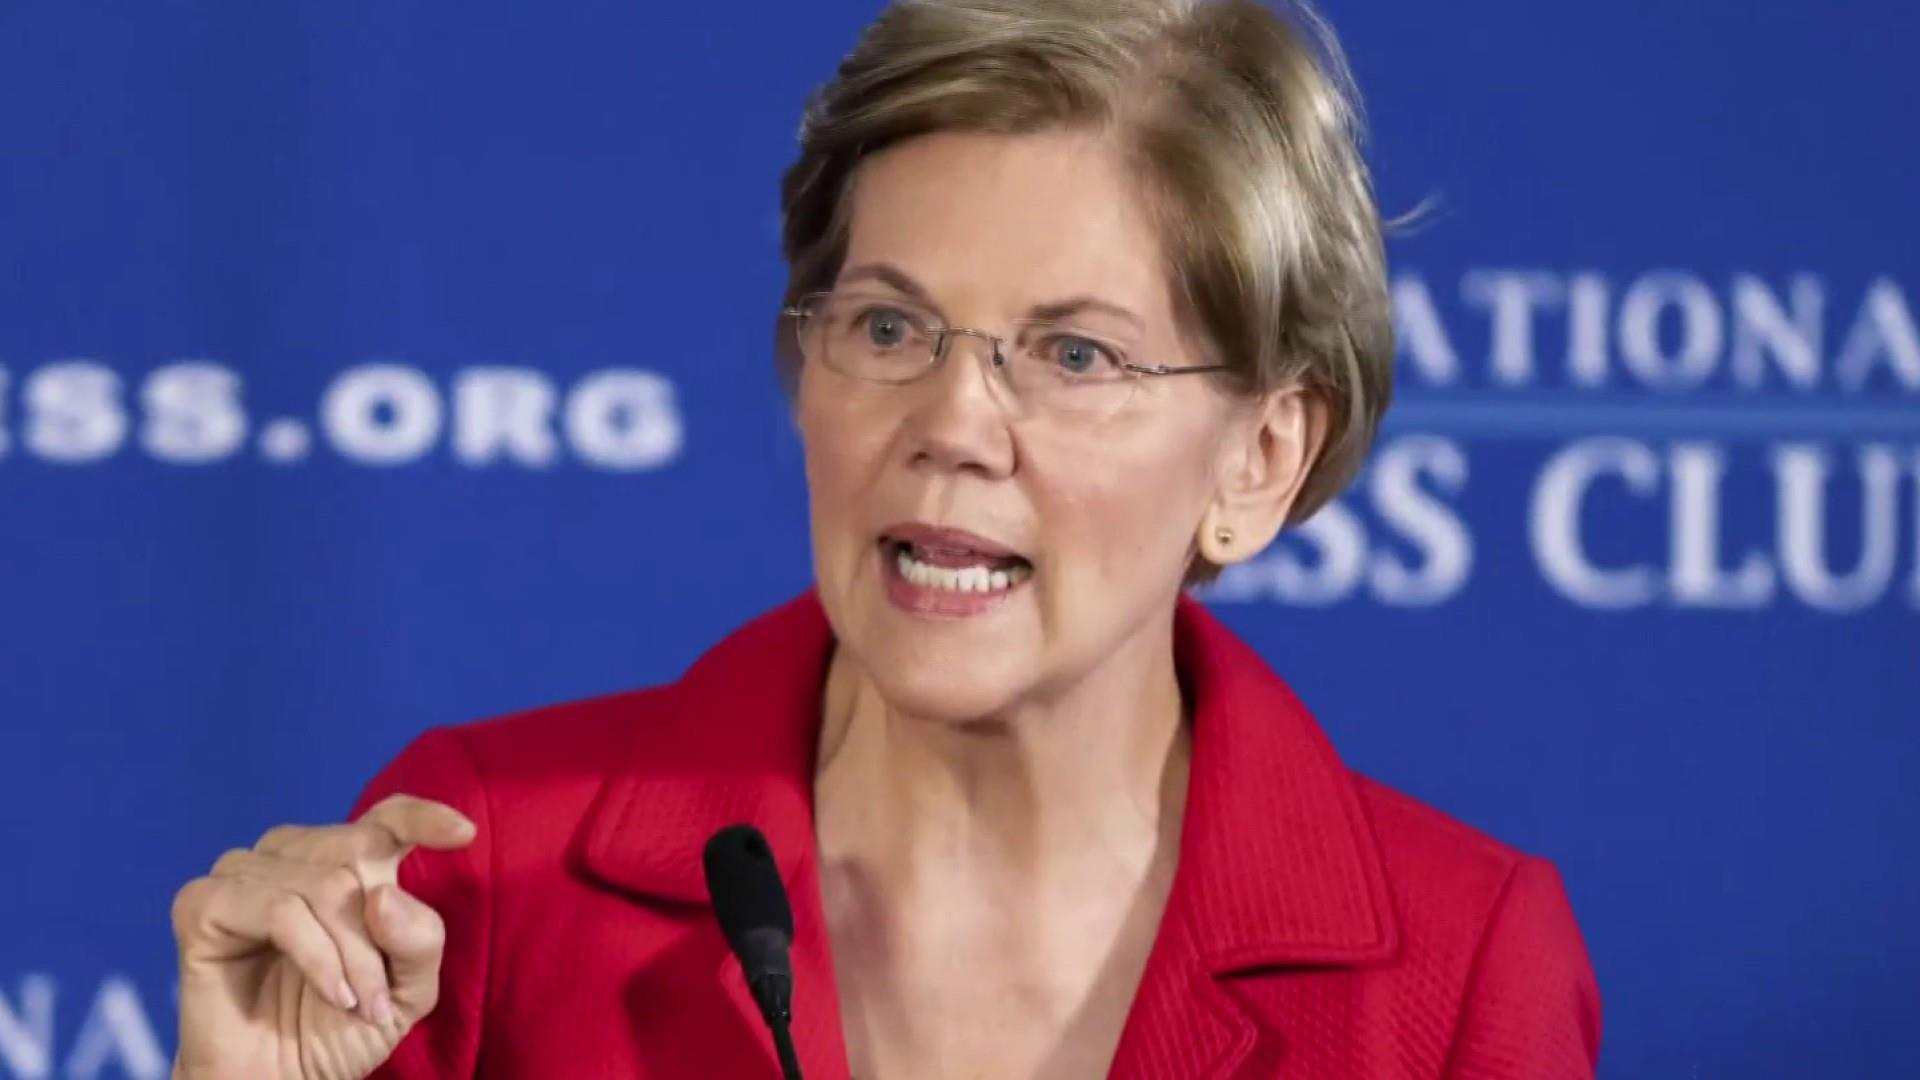 Elizabeth Warren's DNA test raises fraught questions of Native